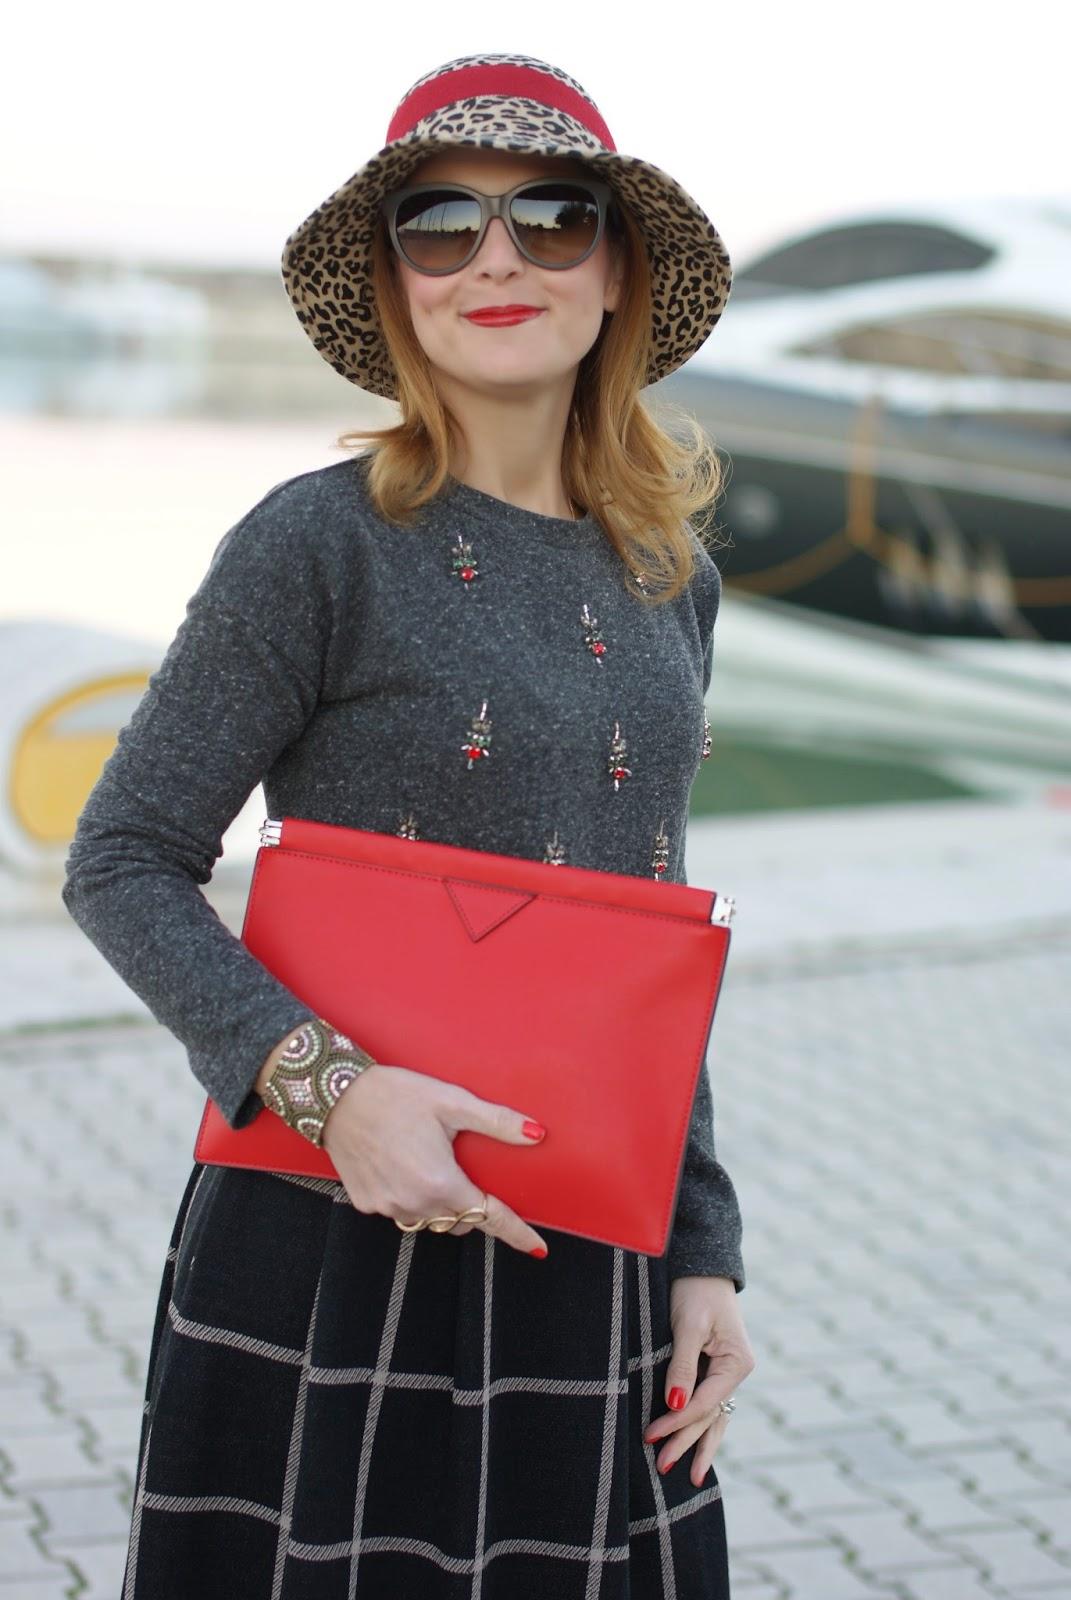 rhinestones sweatshirt, check midi skirt, red clutch, Fashion and Cookies, fashion blogger